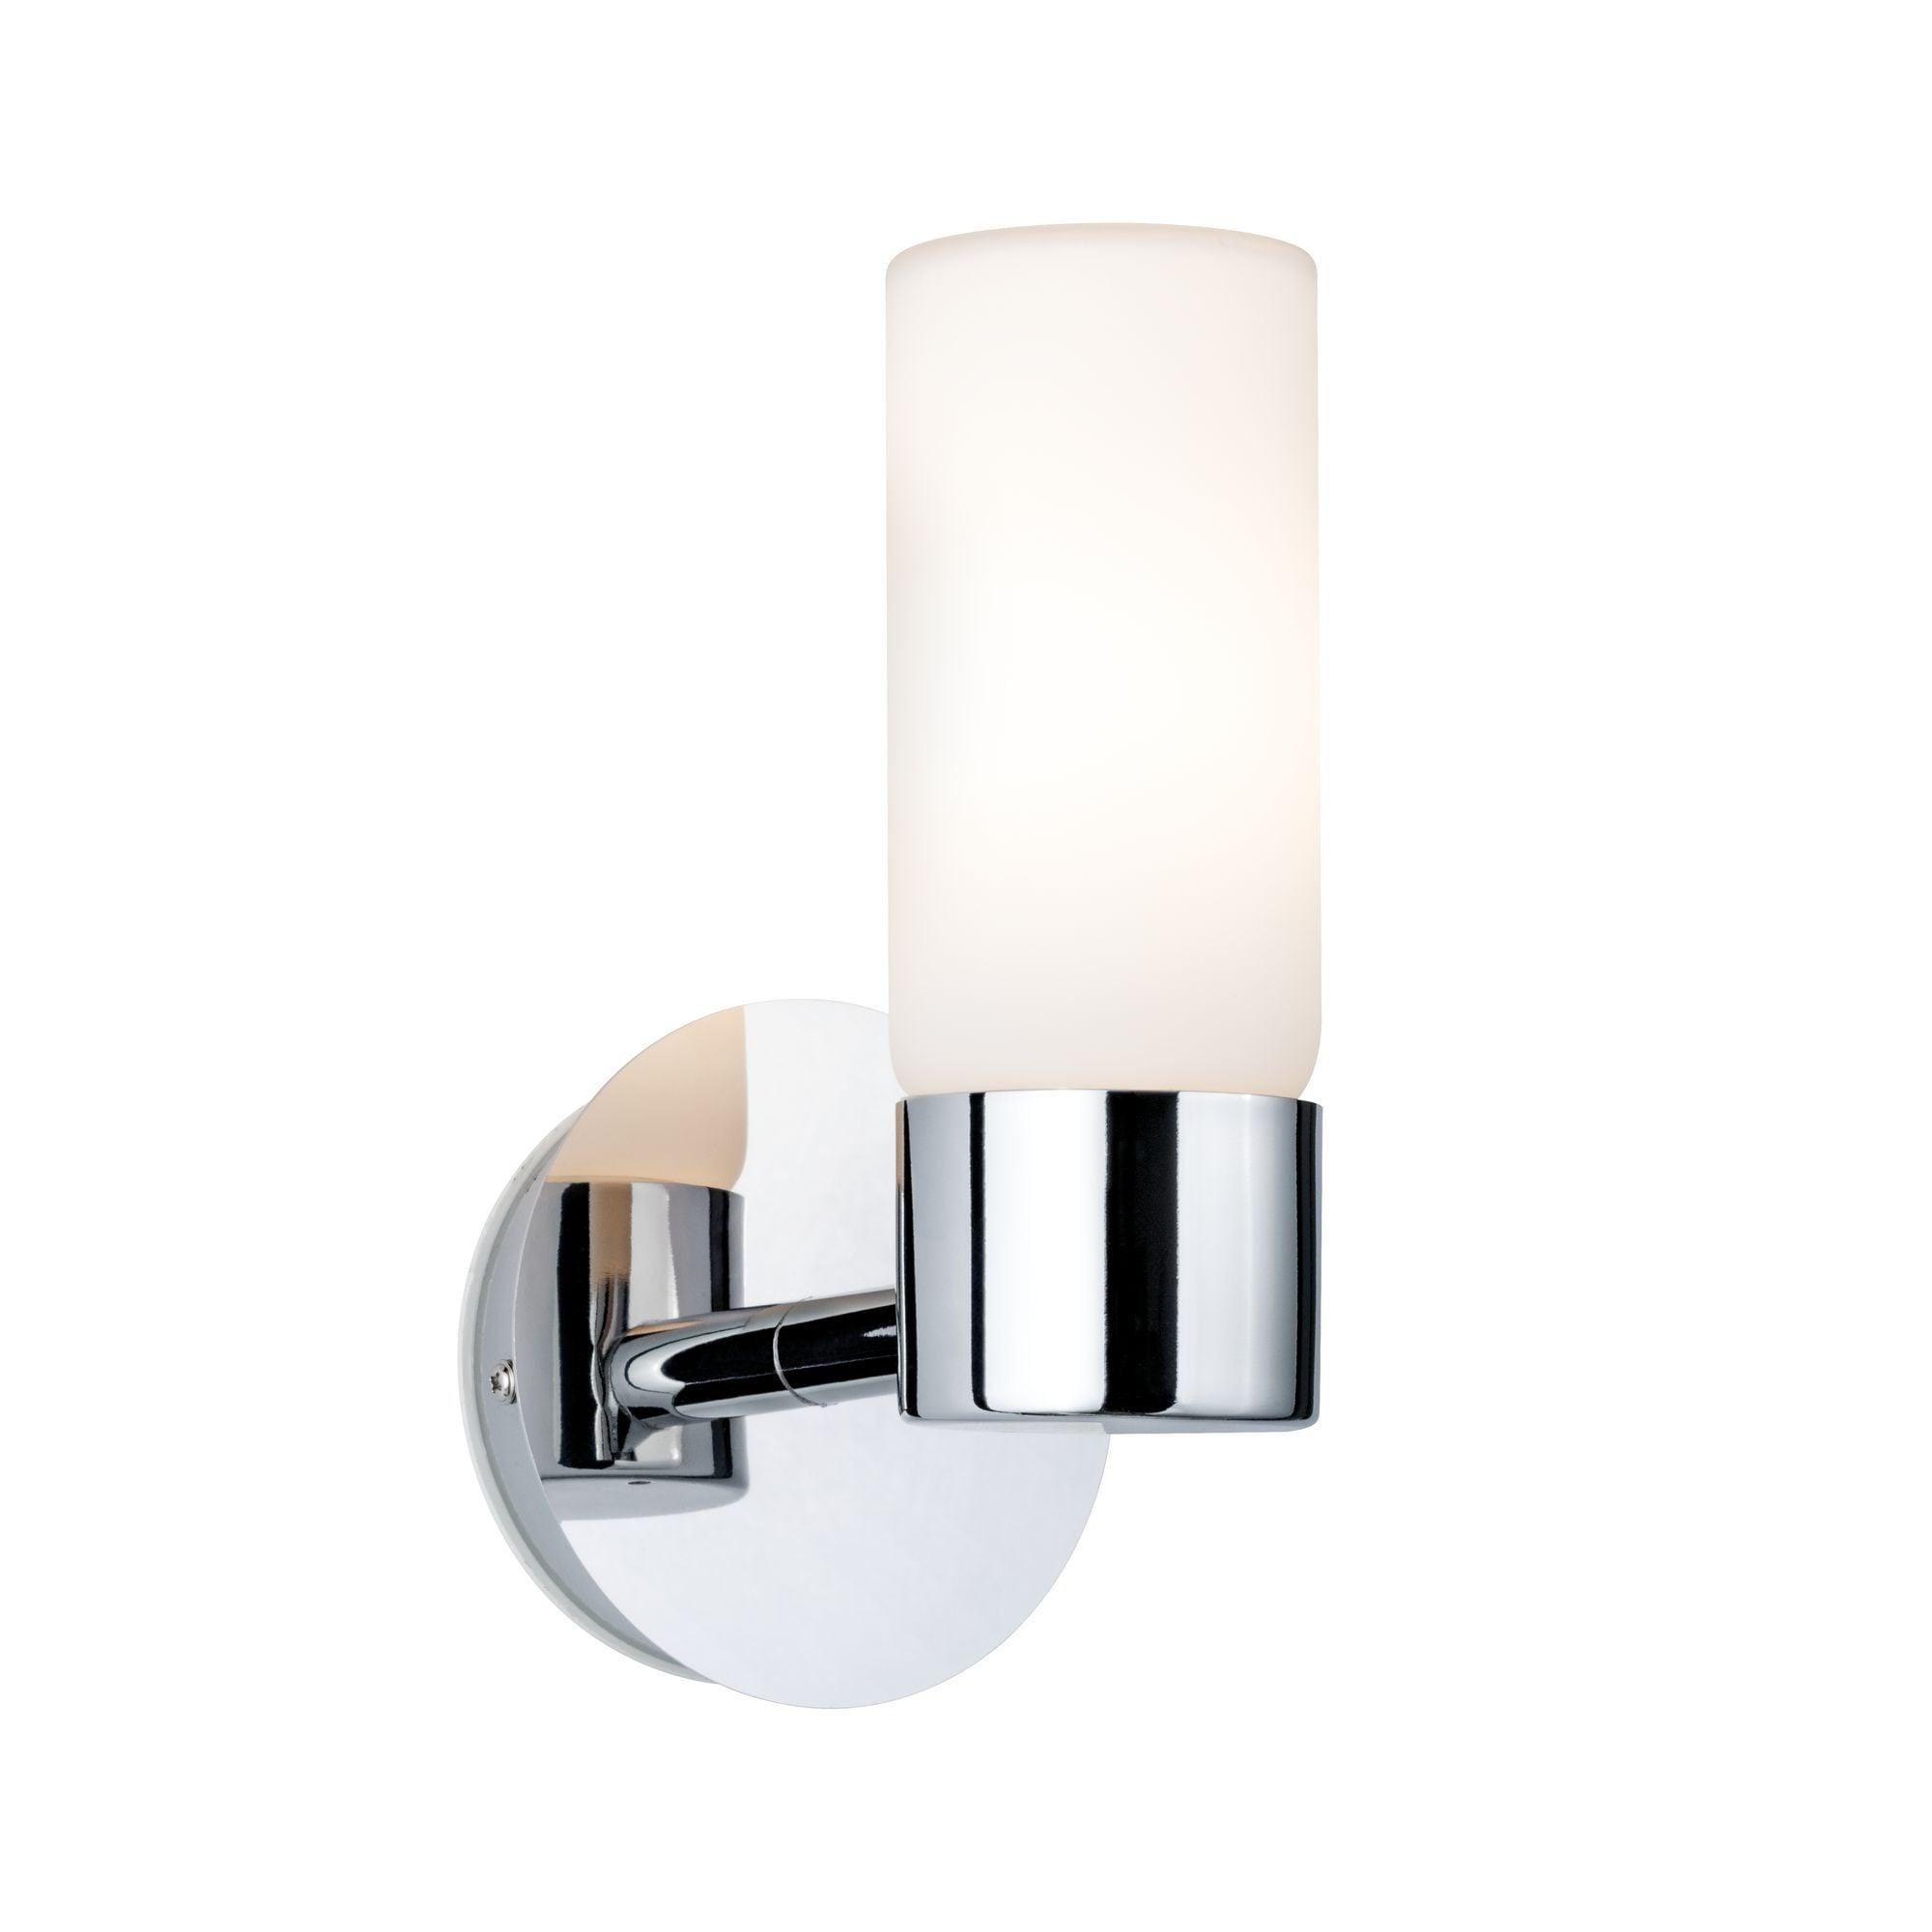 Paulmann,LED Wandleuchte Eleon Chrom, max. 33W G9